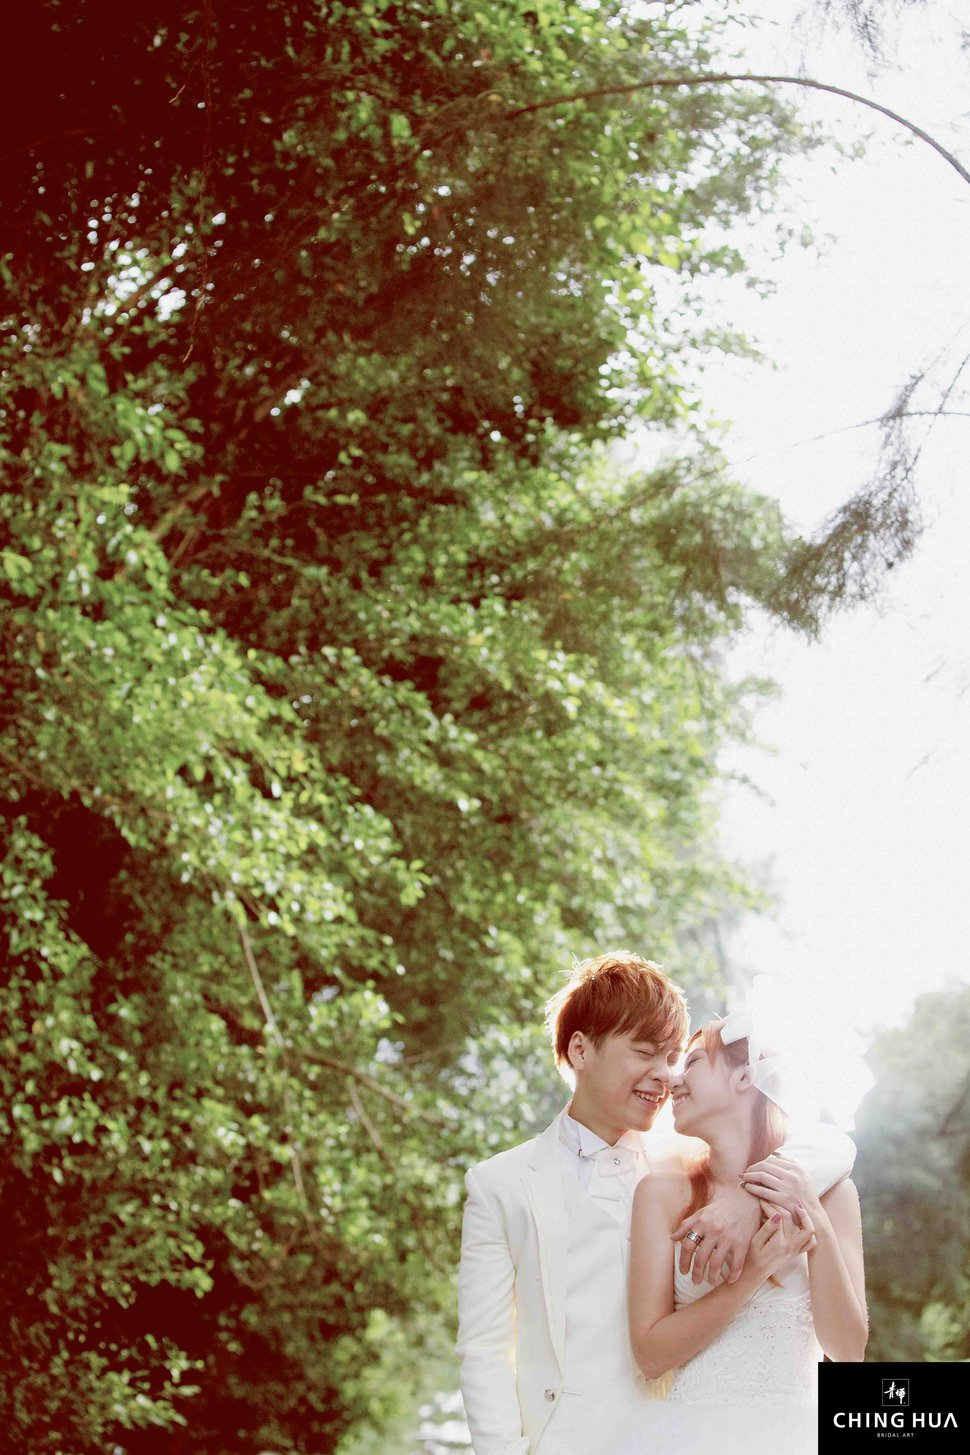 (編號:409906) - 青樺婚紗CHINGHUA - 結婚吧